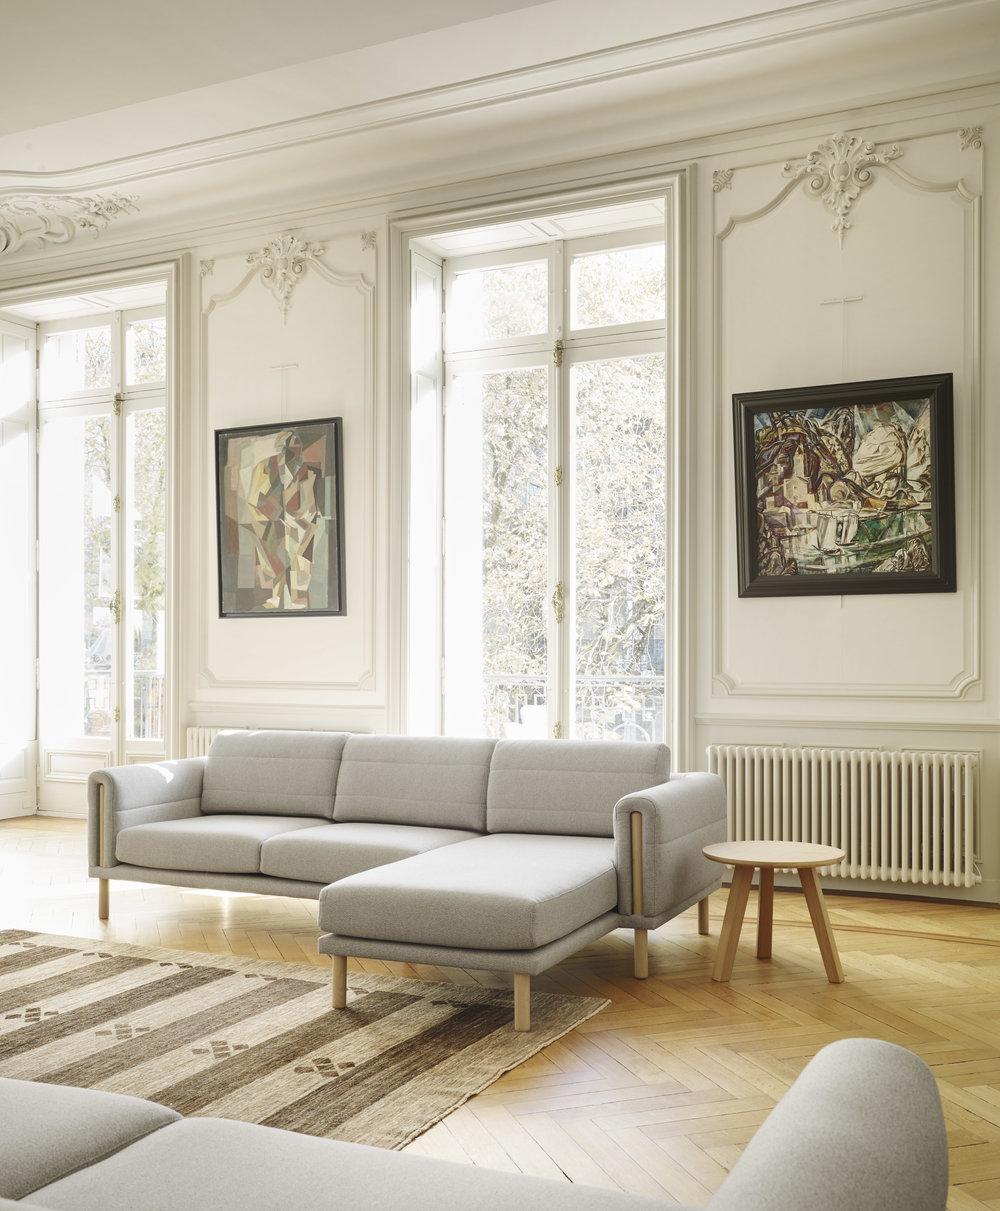 Abric sofa-Silvia Ceñal-Bosc-11